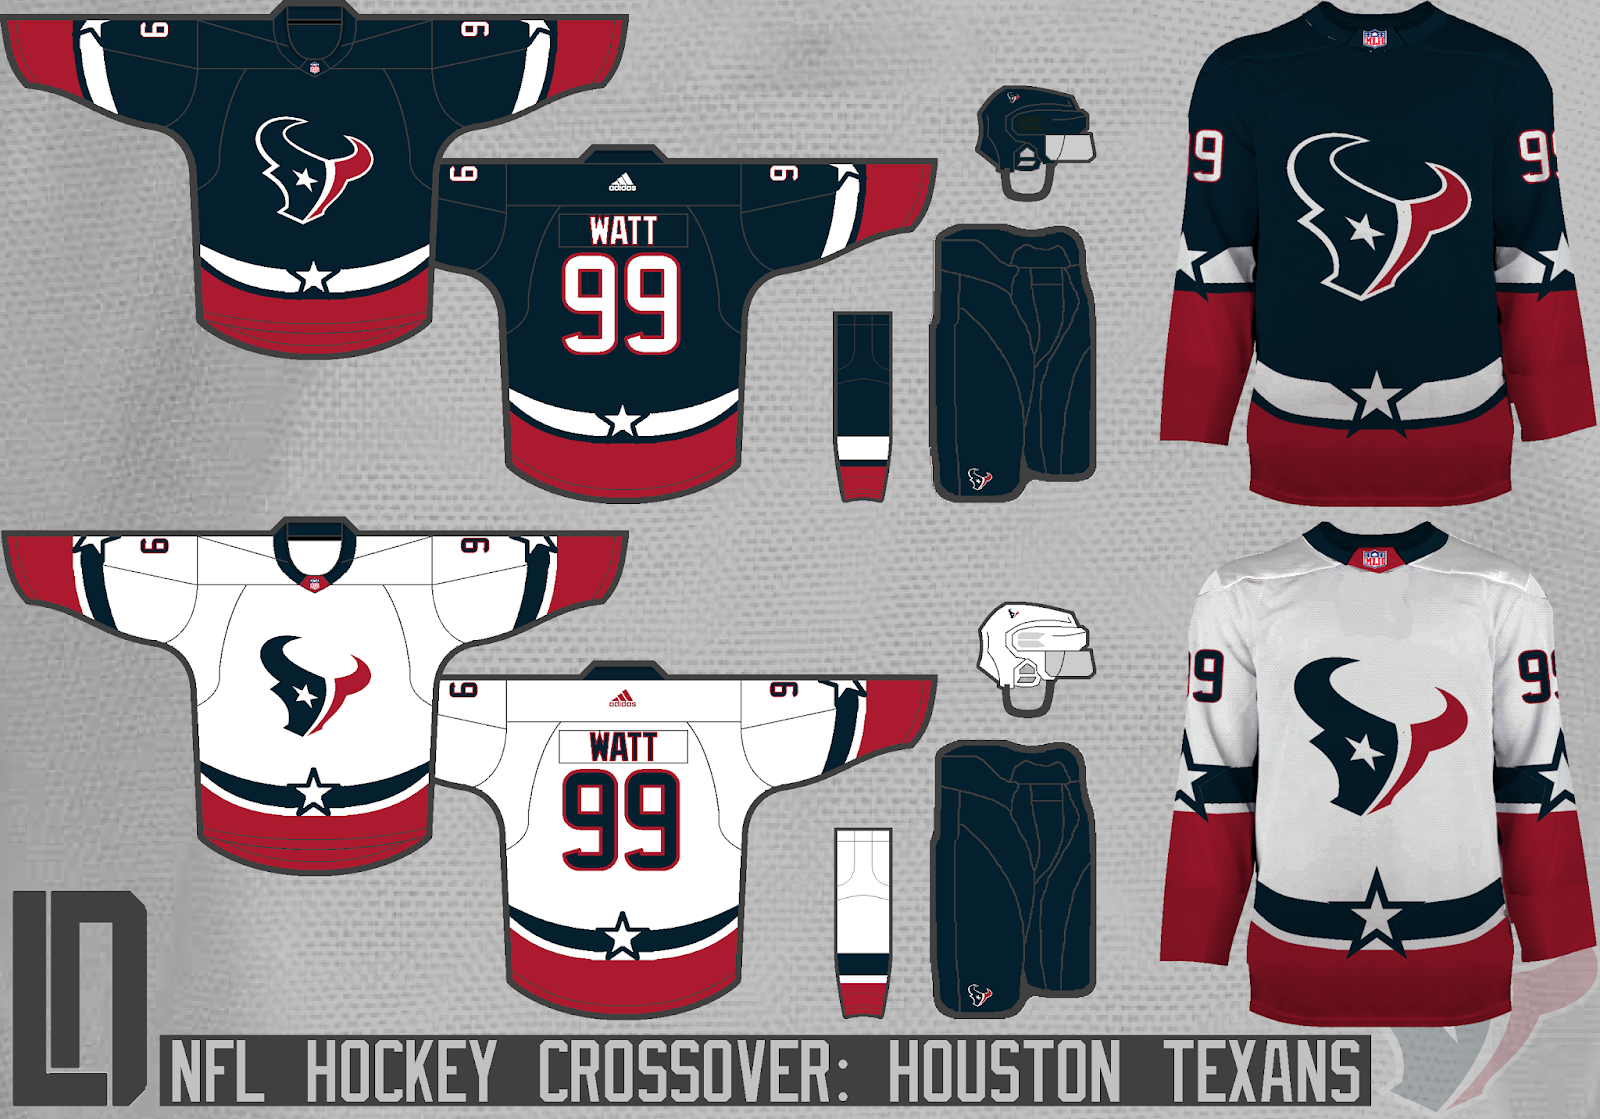 Houston+Texans+Concept.png